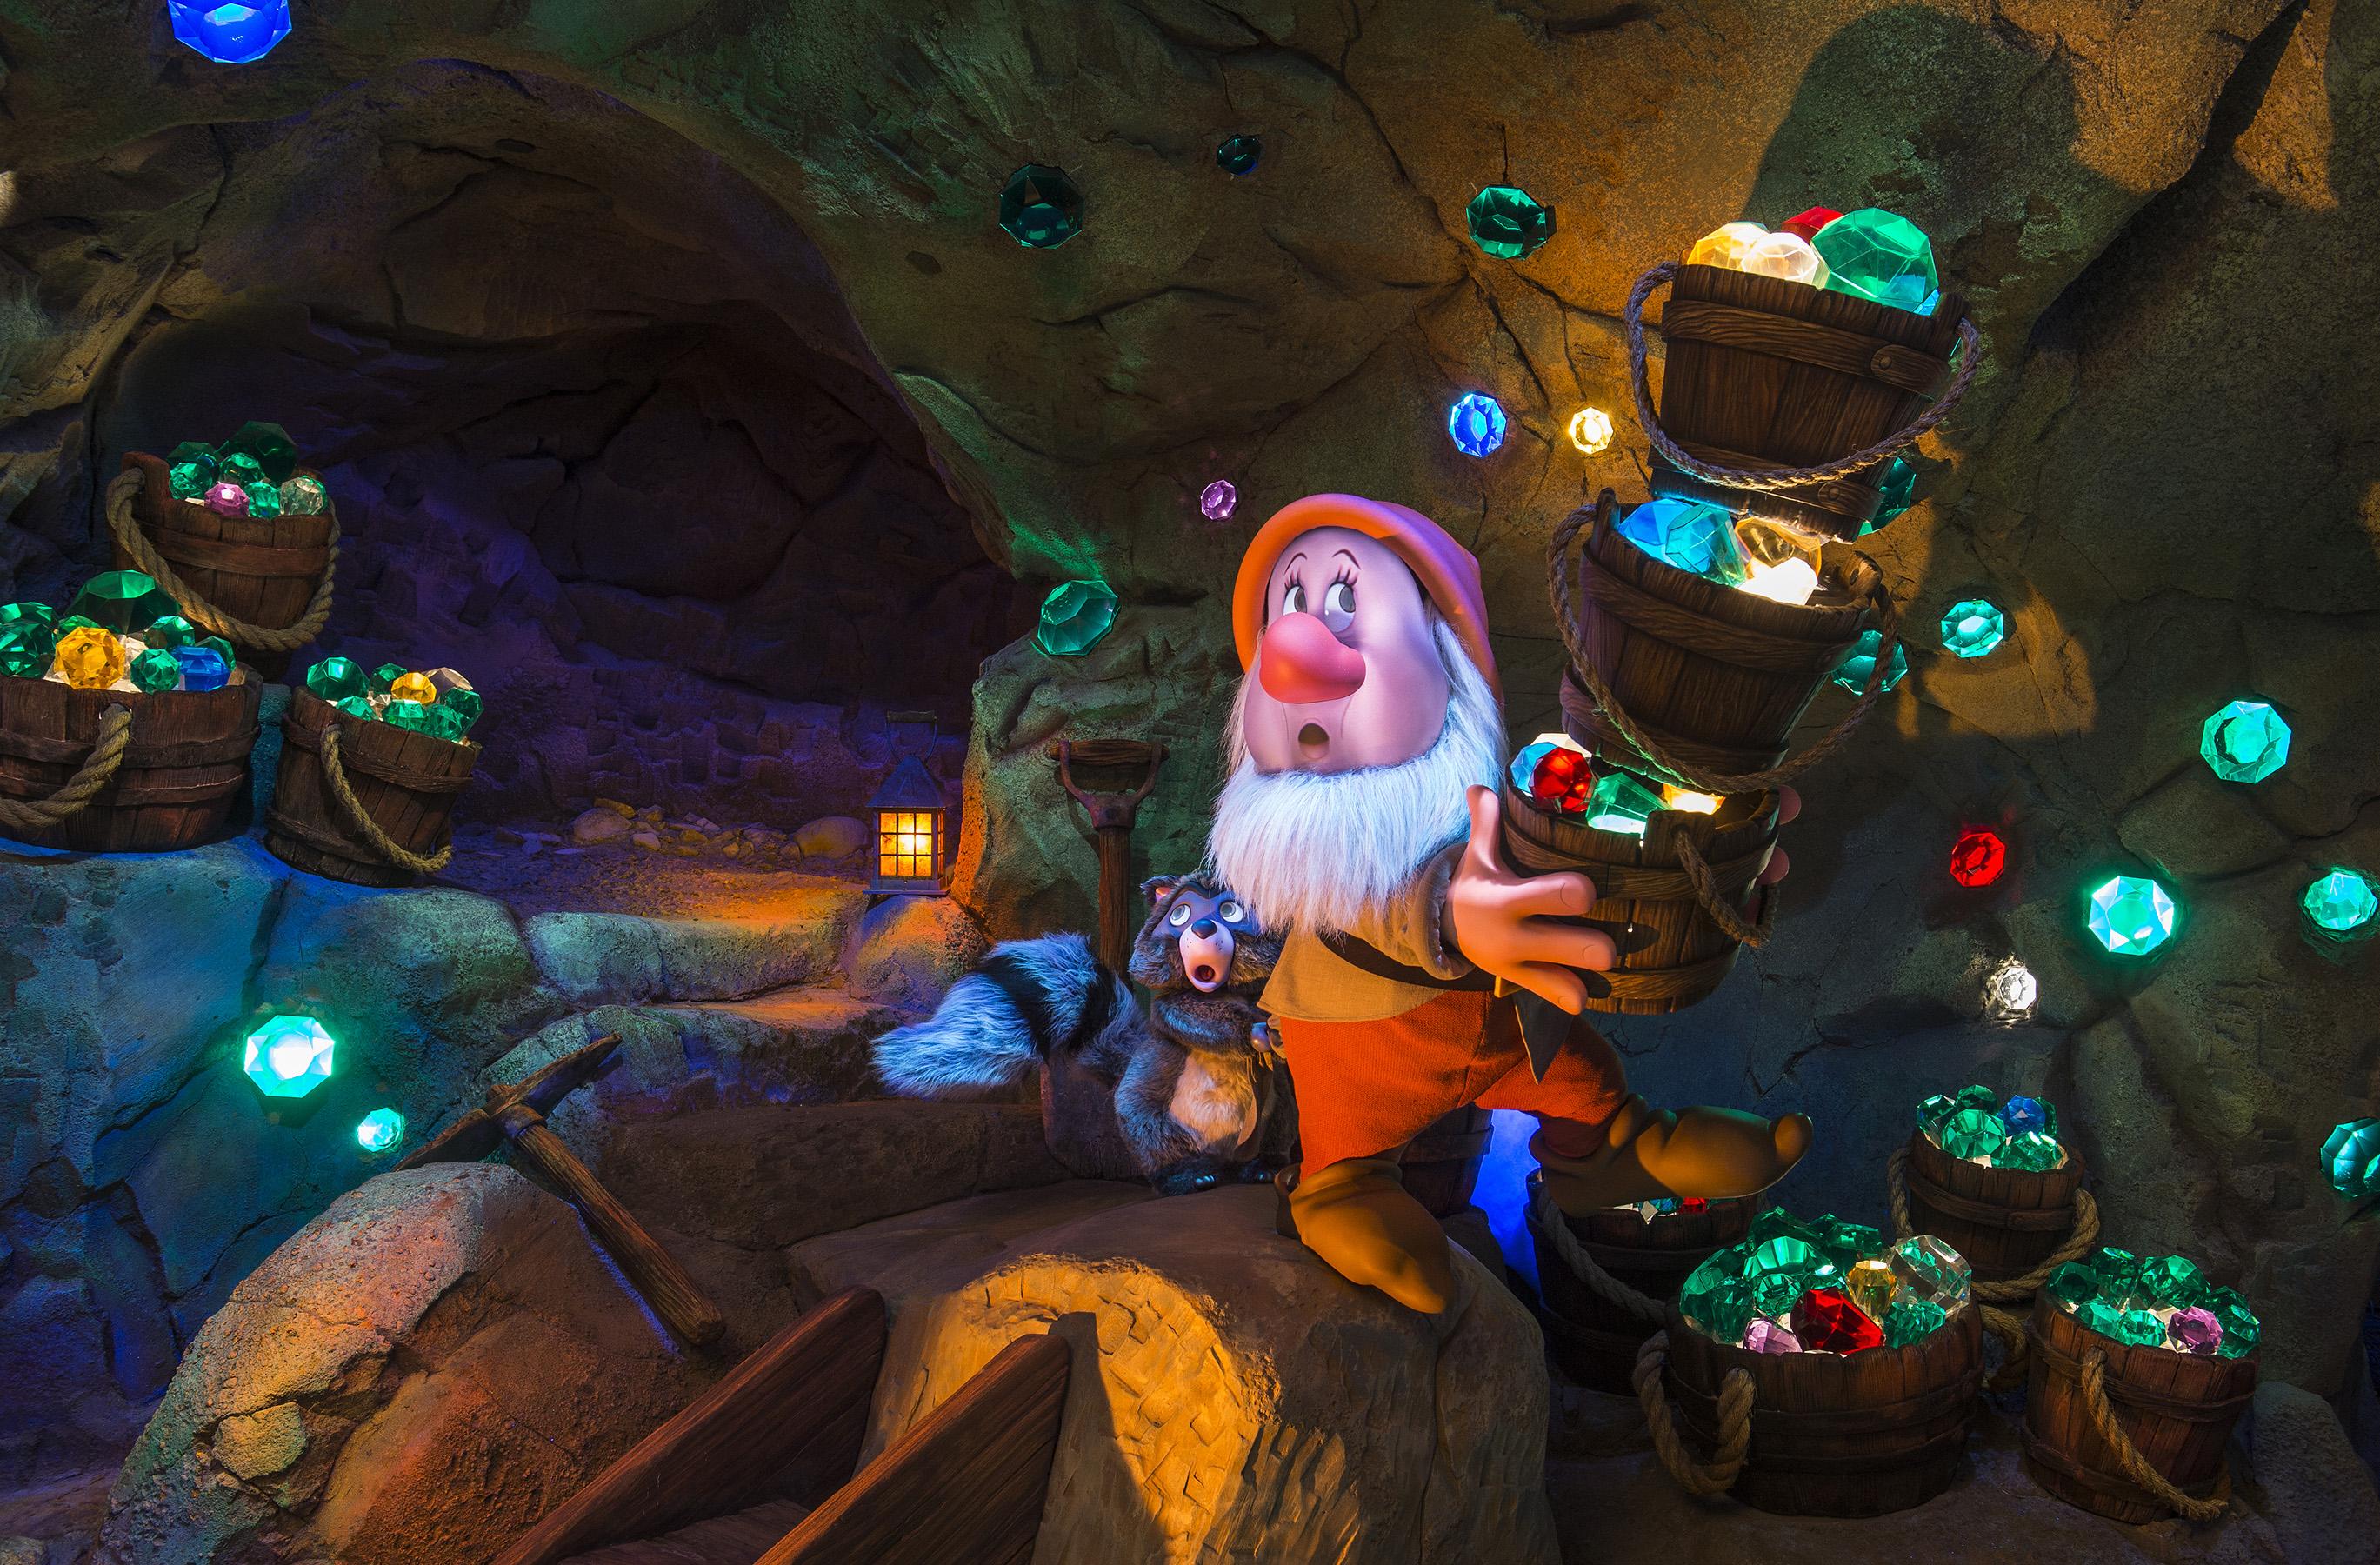 Seven dwarfs game tips porncraft tube